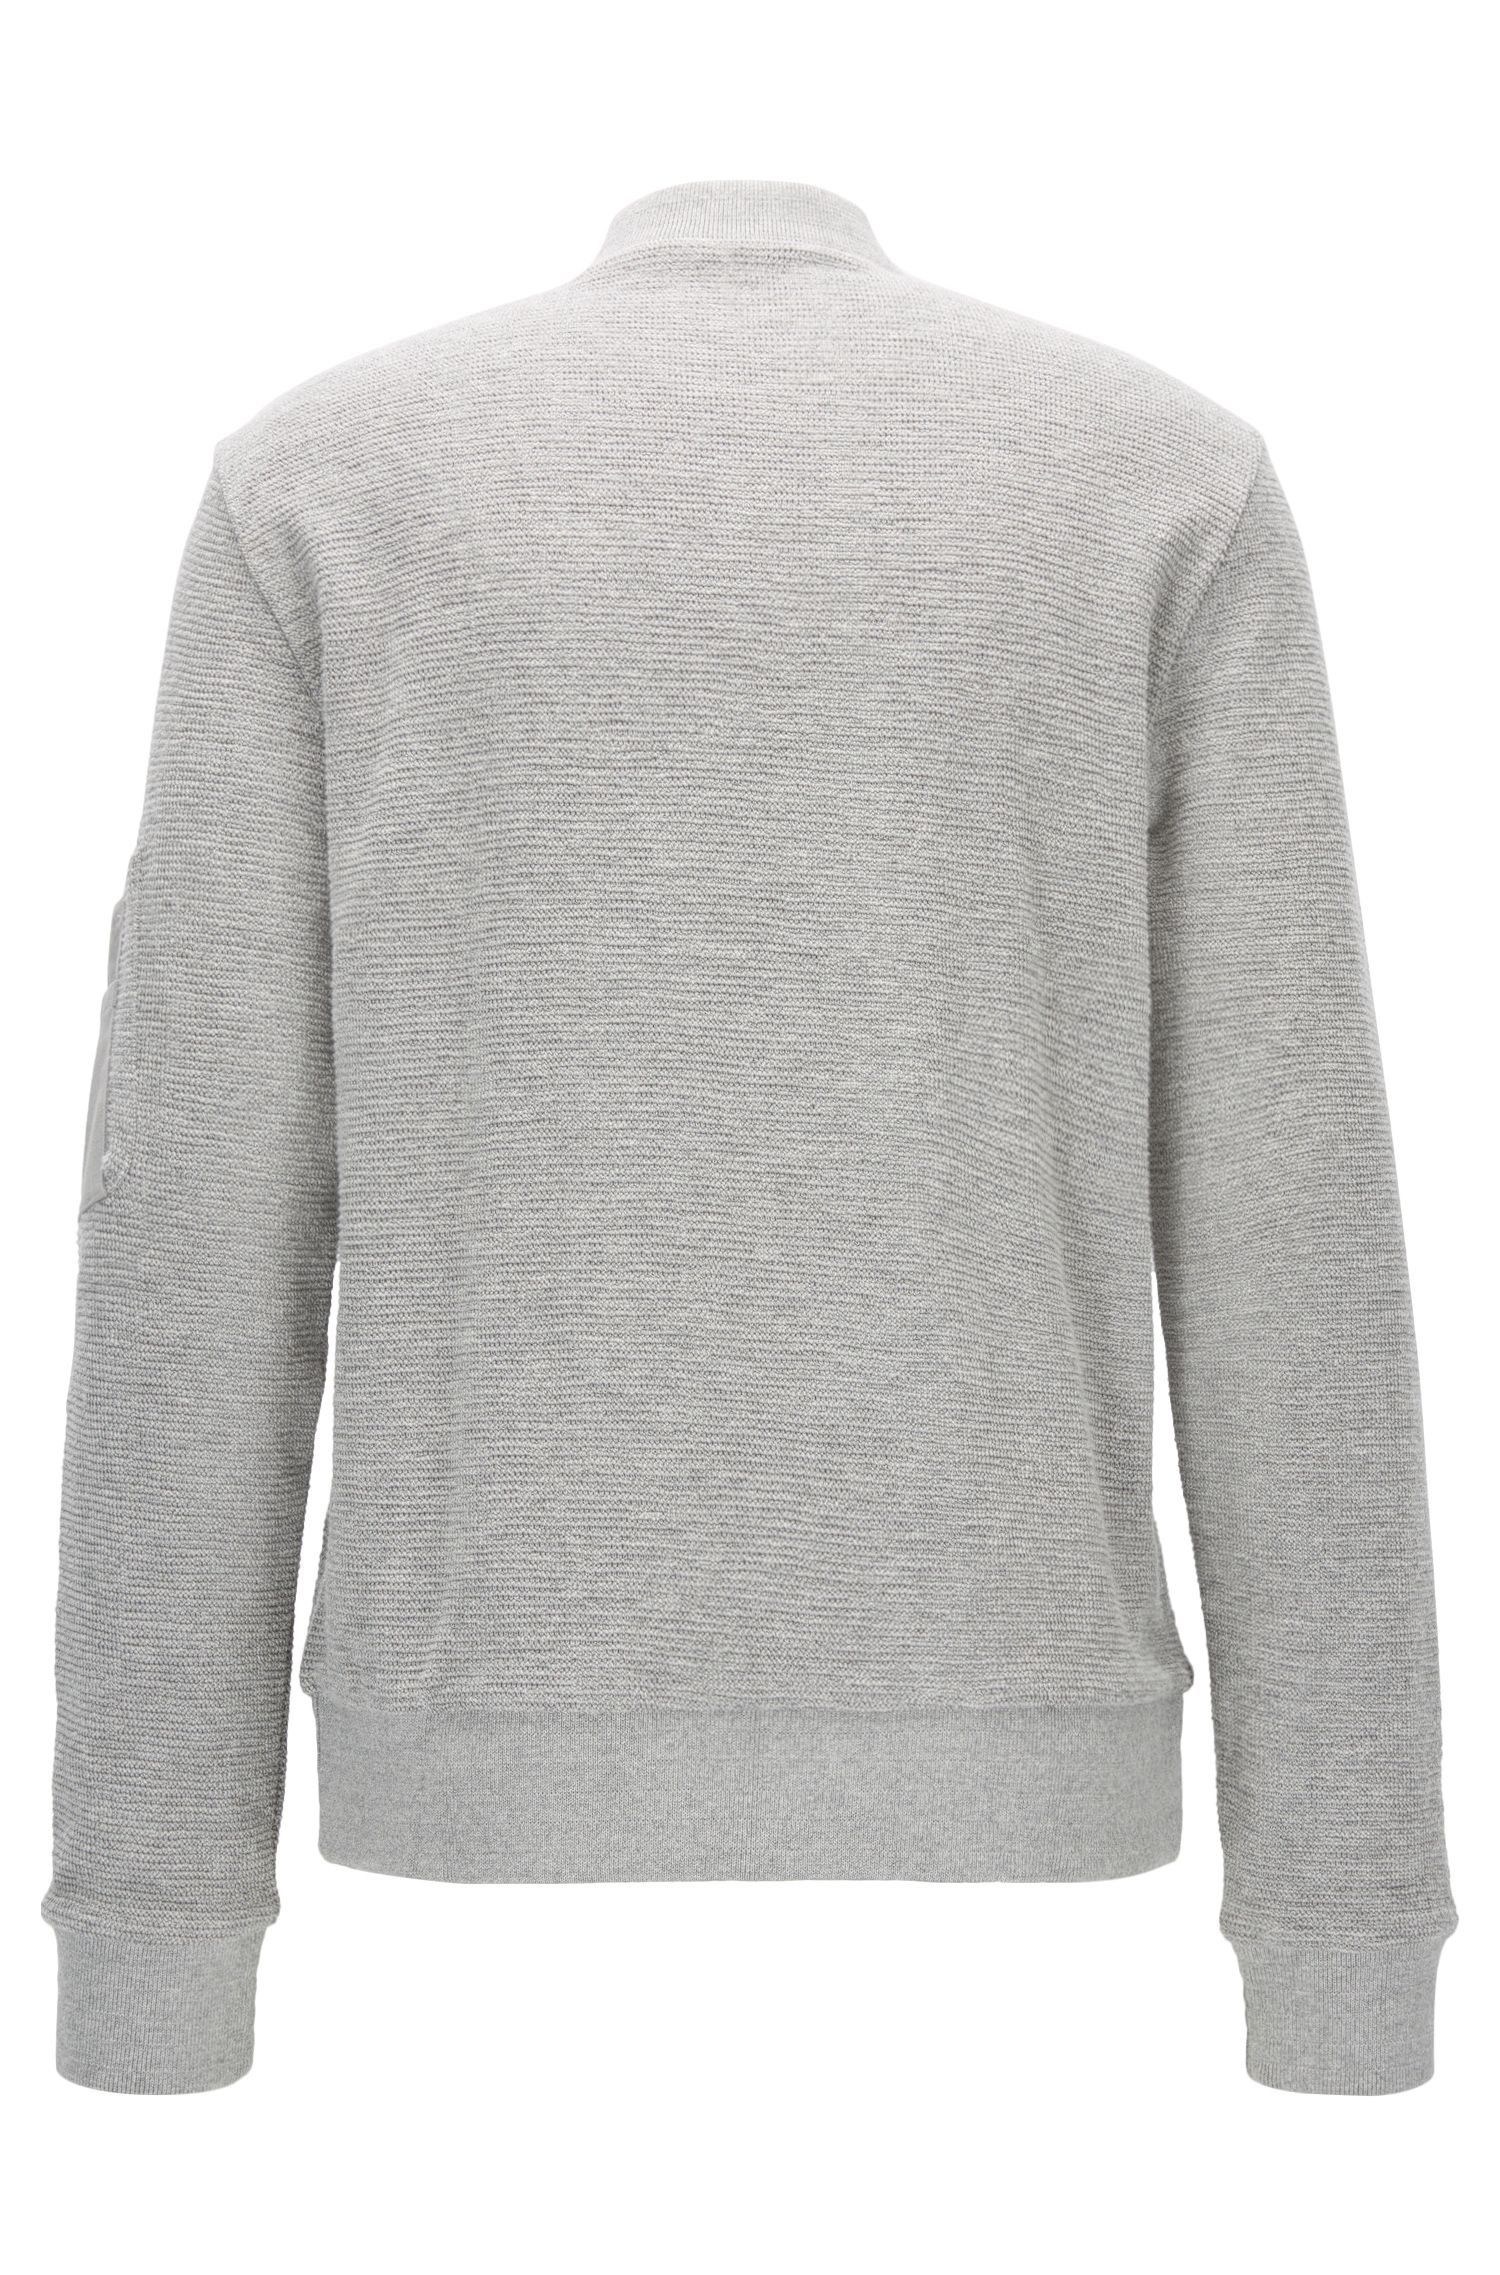 Bomber-style sweatshirt in cotton jacquard